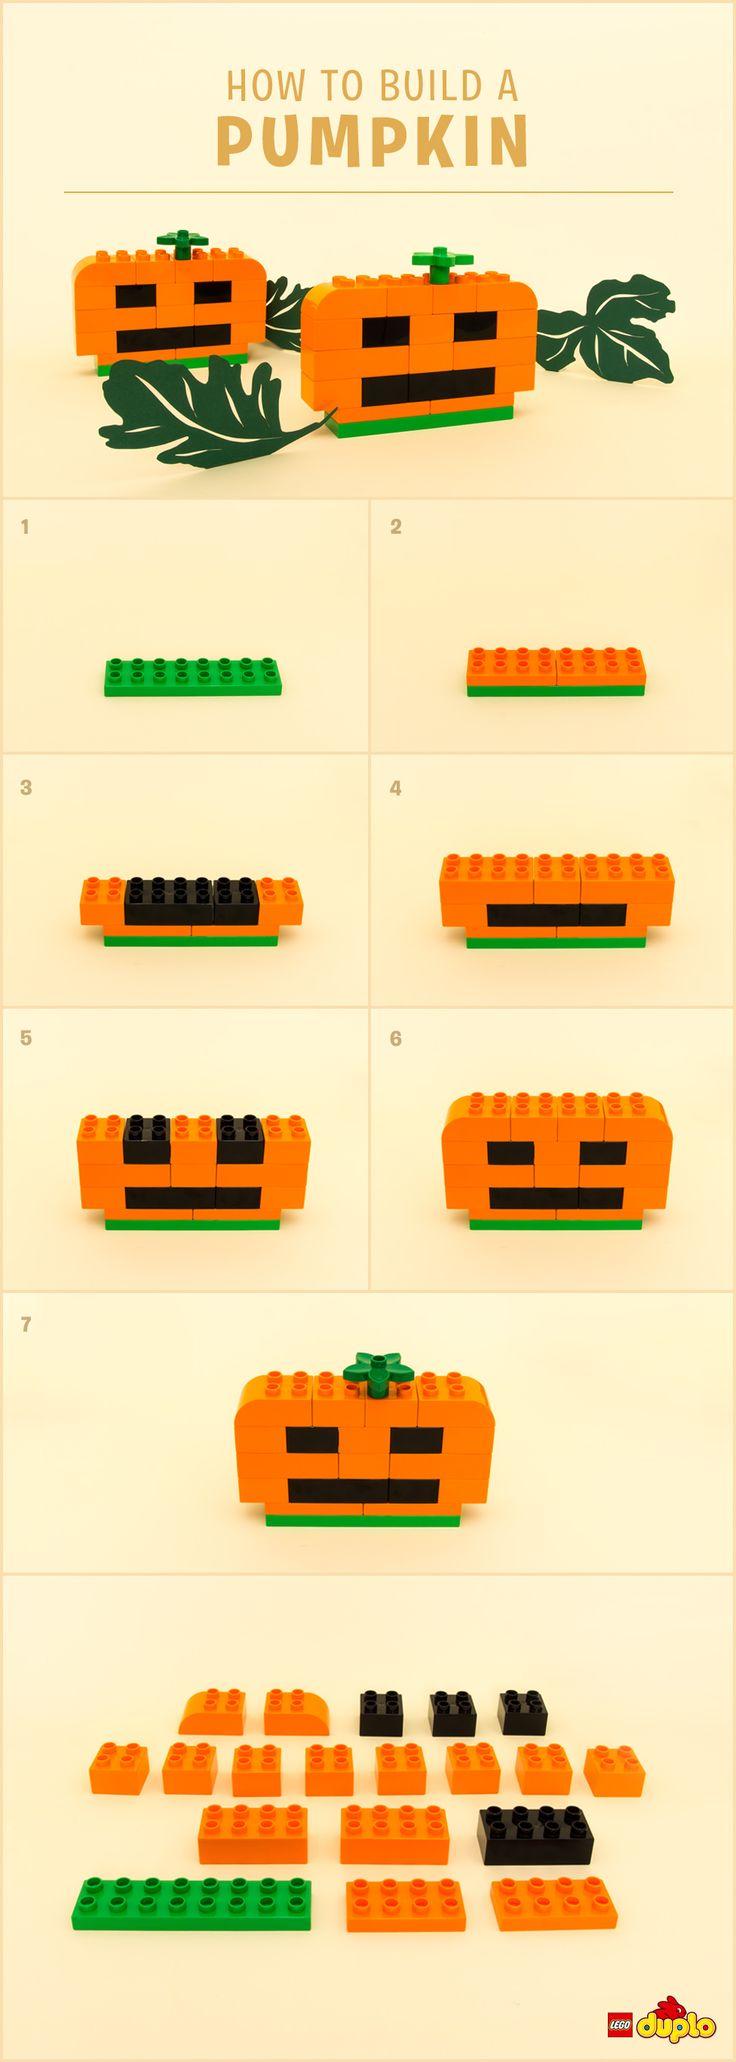 Planning for Halloween? This DIY LEGO DUPLO pumpkin comes with no stickiness guaranteed ;-) http://www.lego.com/da-dk/family/articles/easy-no-stickiness-lego-duplo-pumpkin-96c6f4bcea434cbe81f35f99401d7d0f